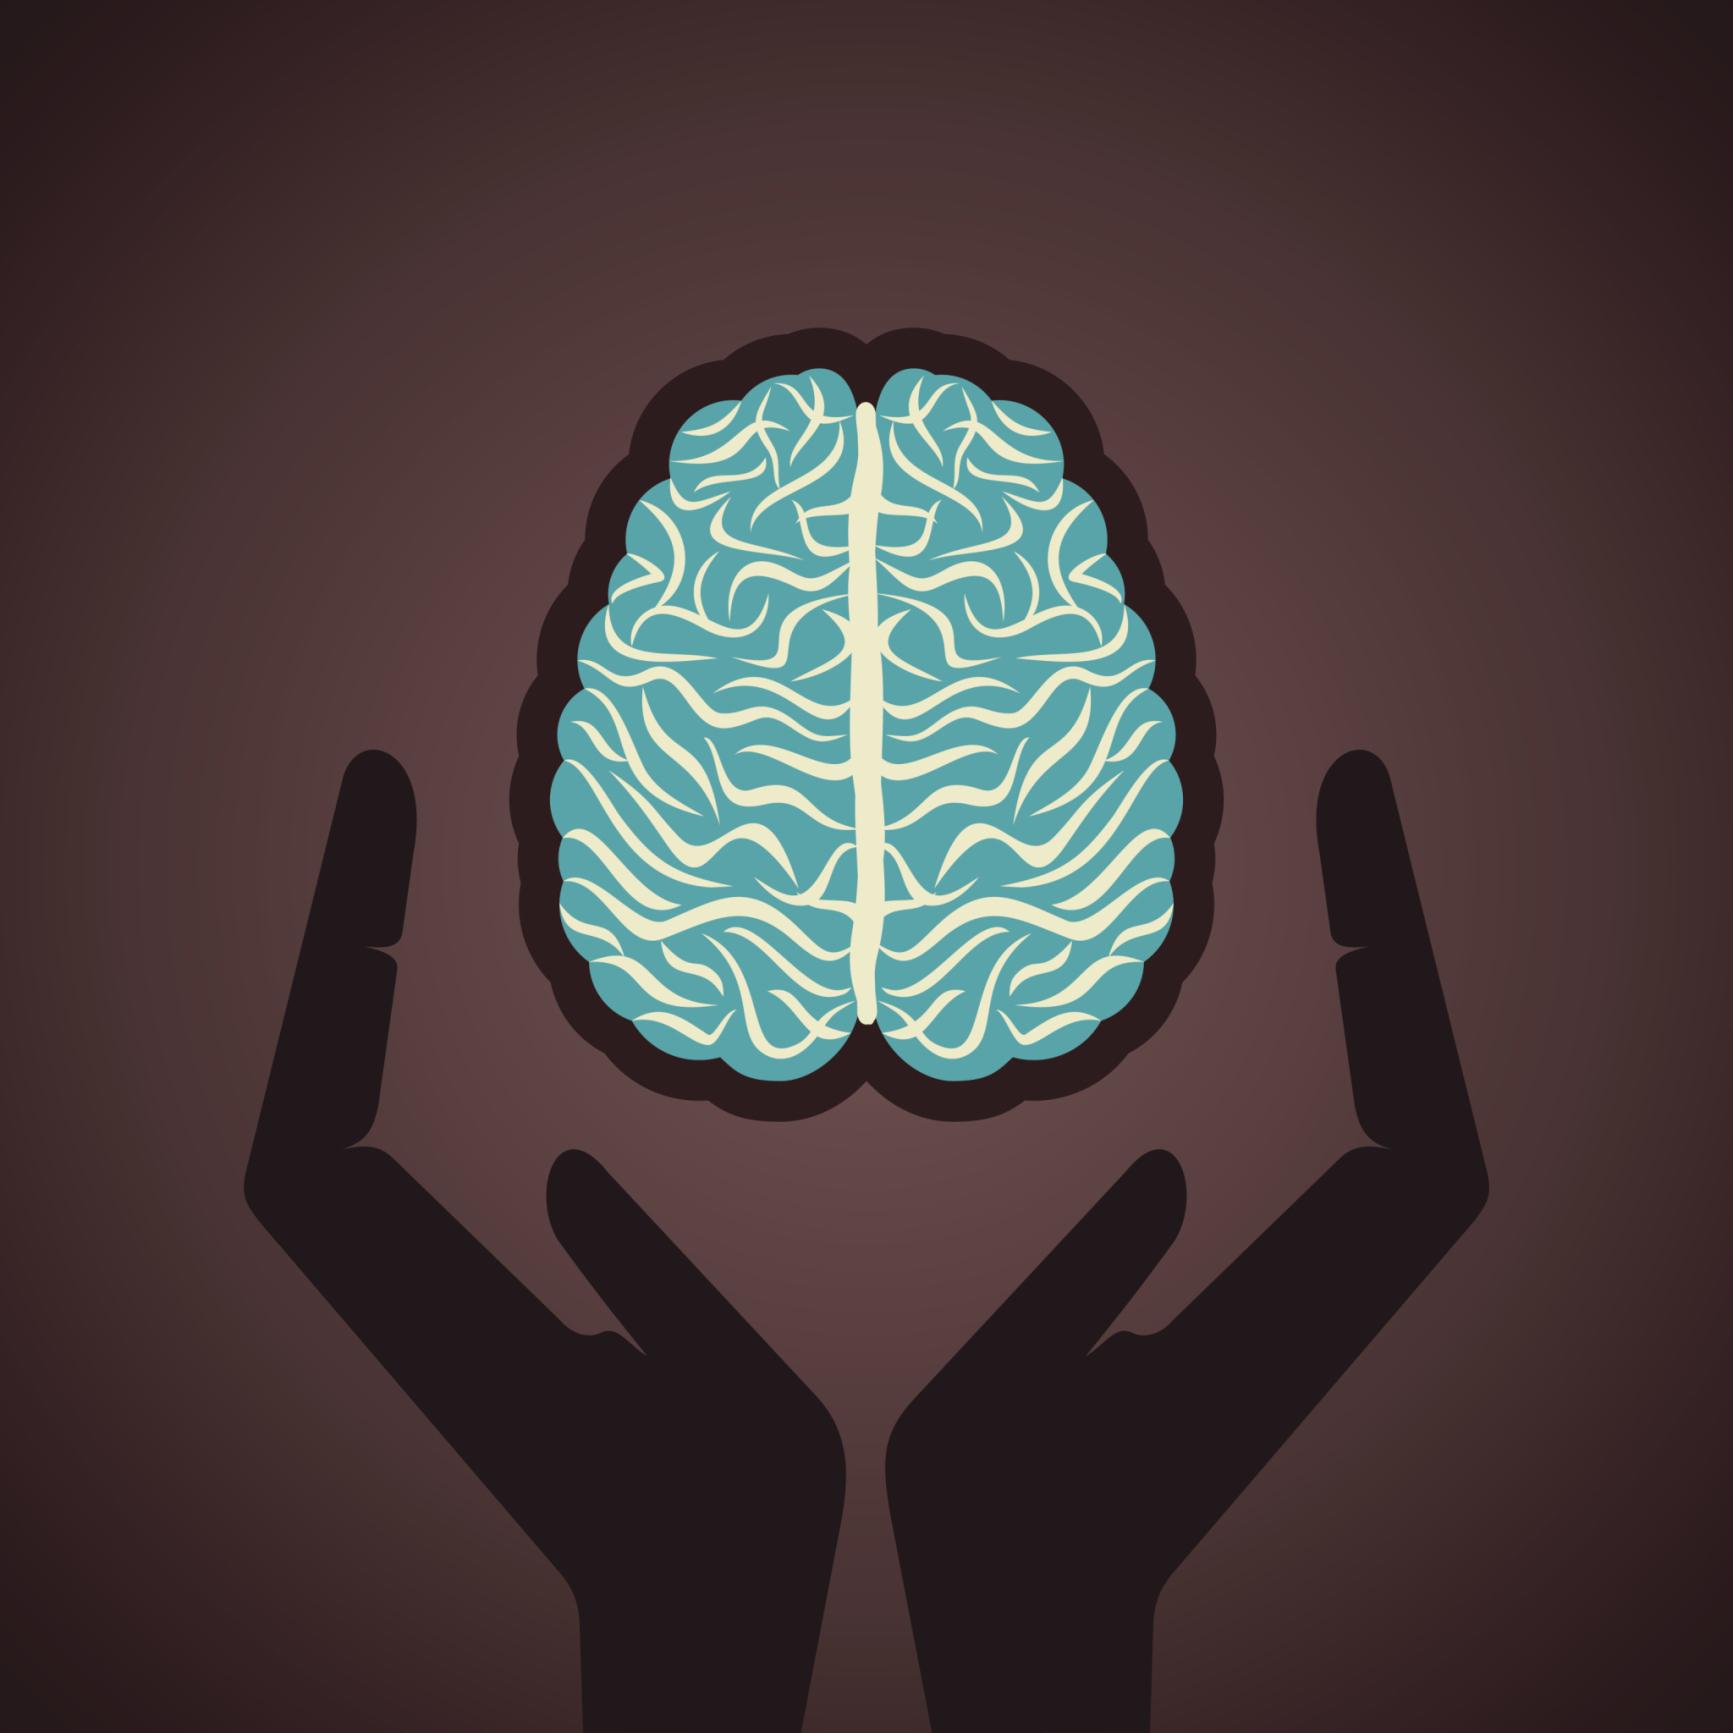 The paleo brain secret - Easy Health Options®